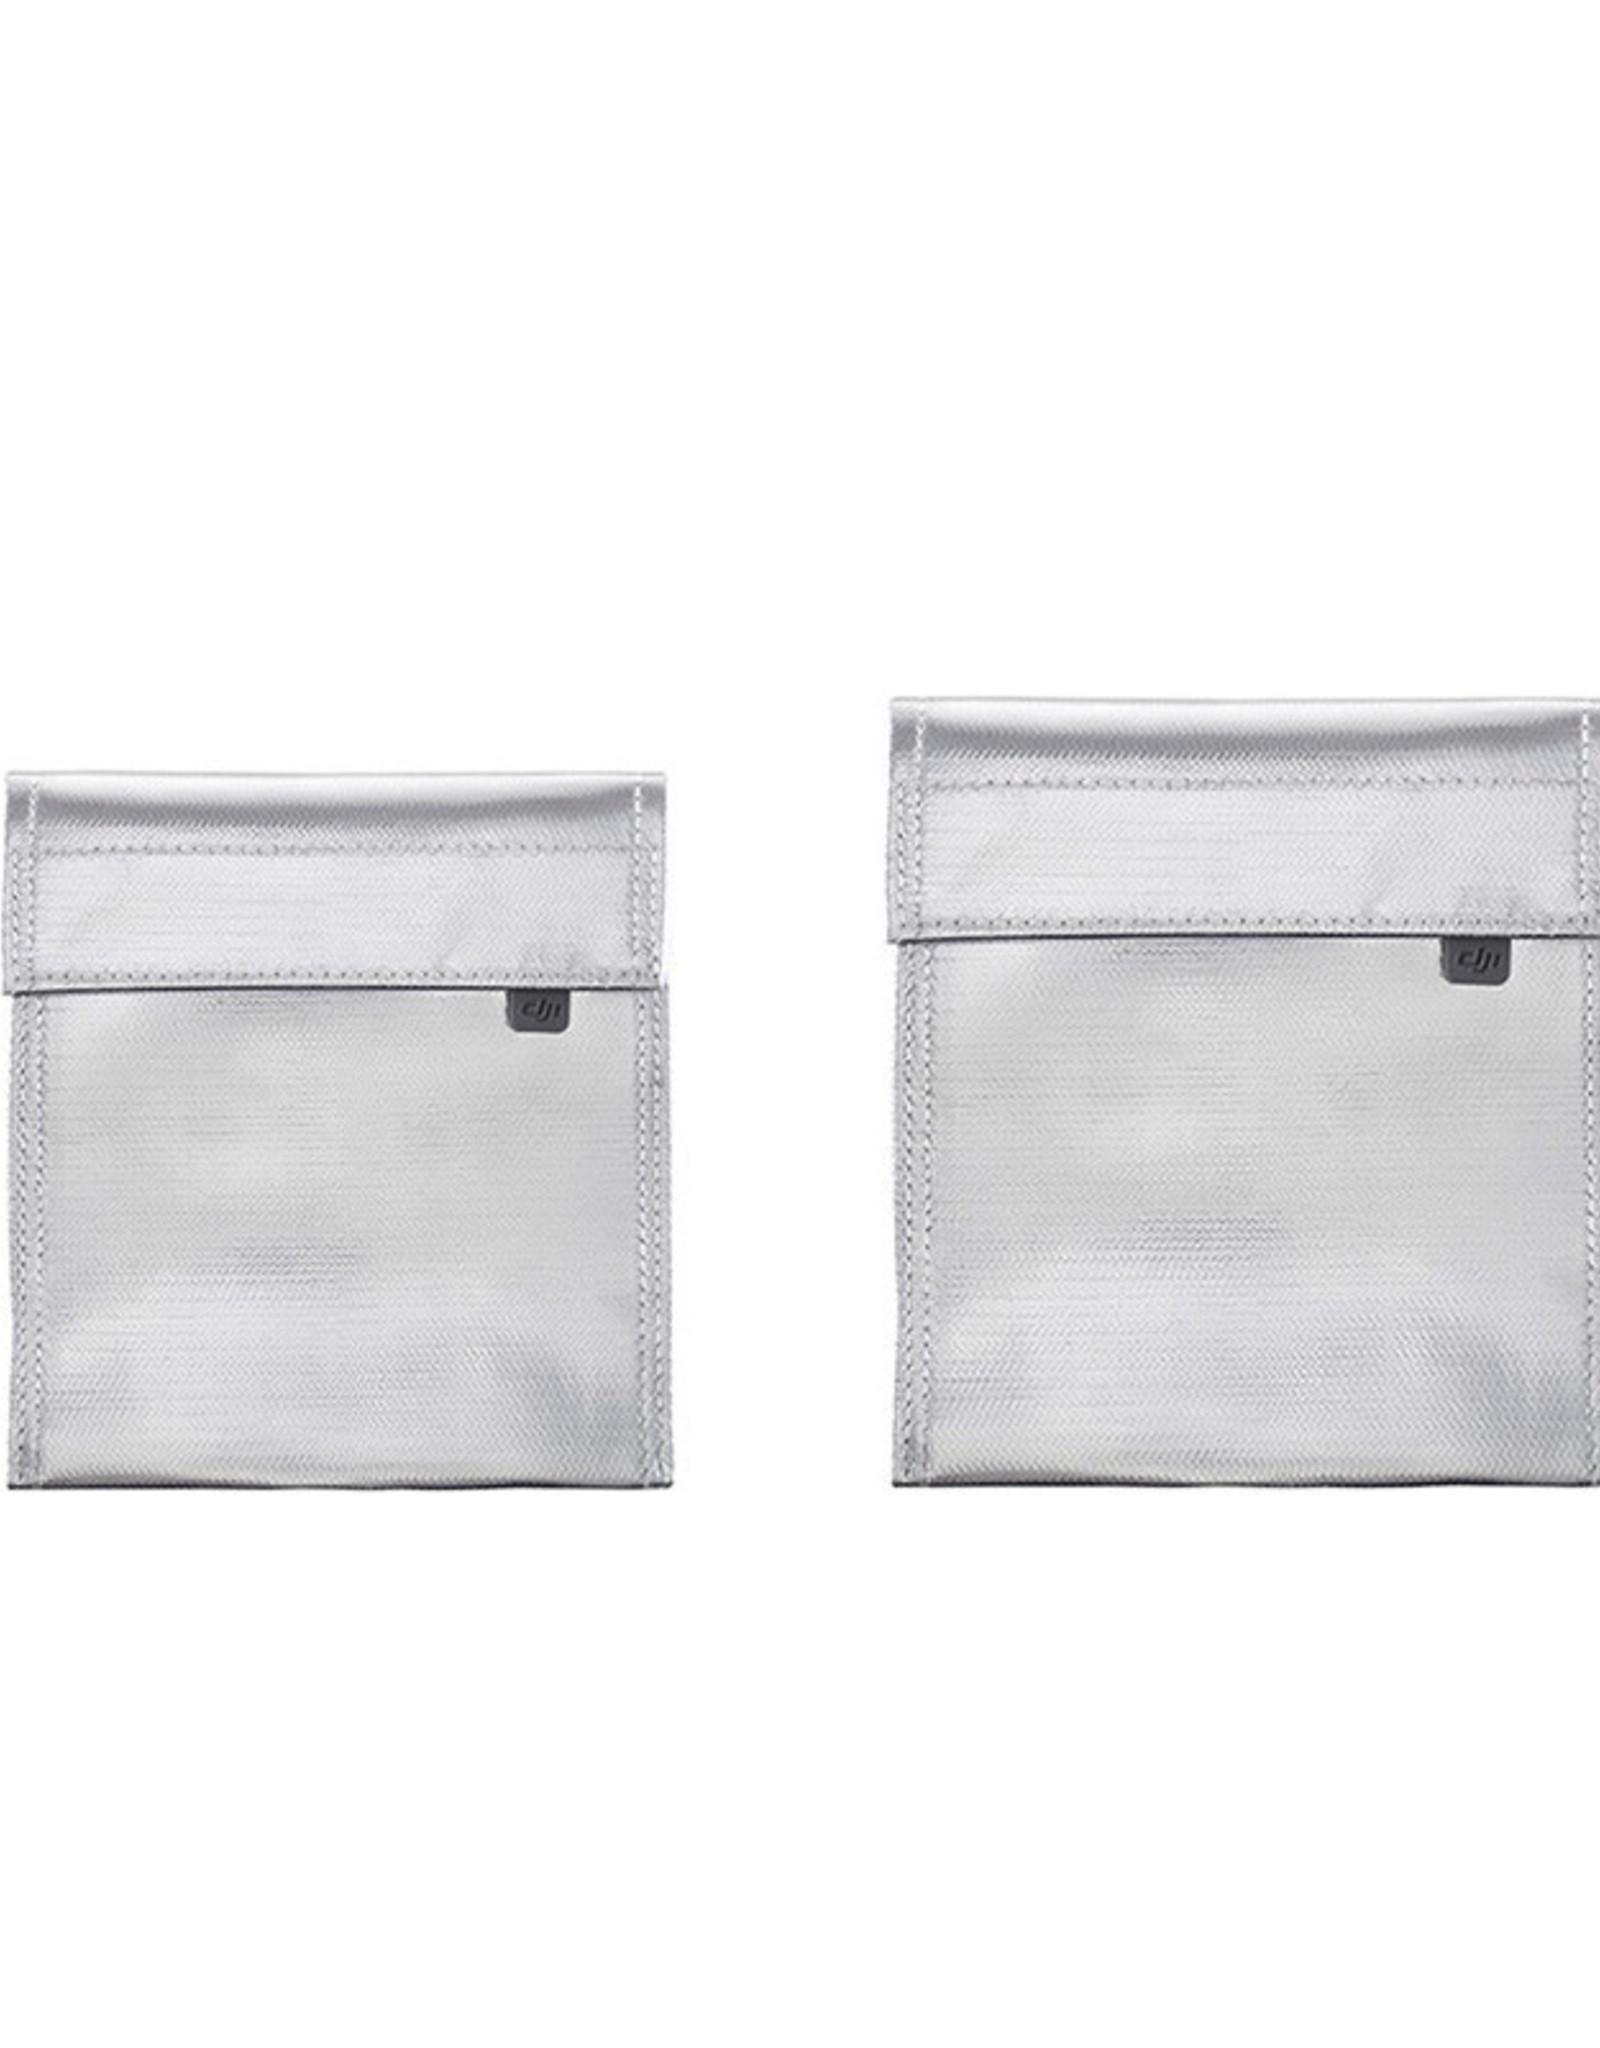 DJI DJI Battery Safe Bag (Small Size)